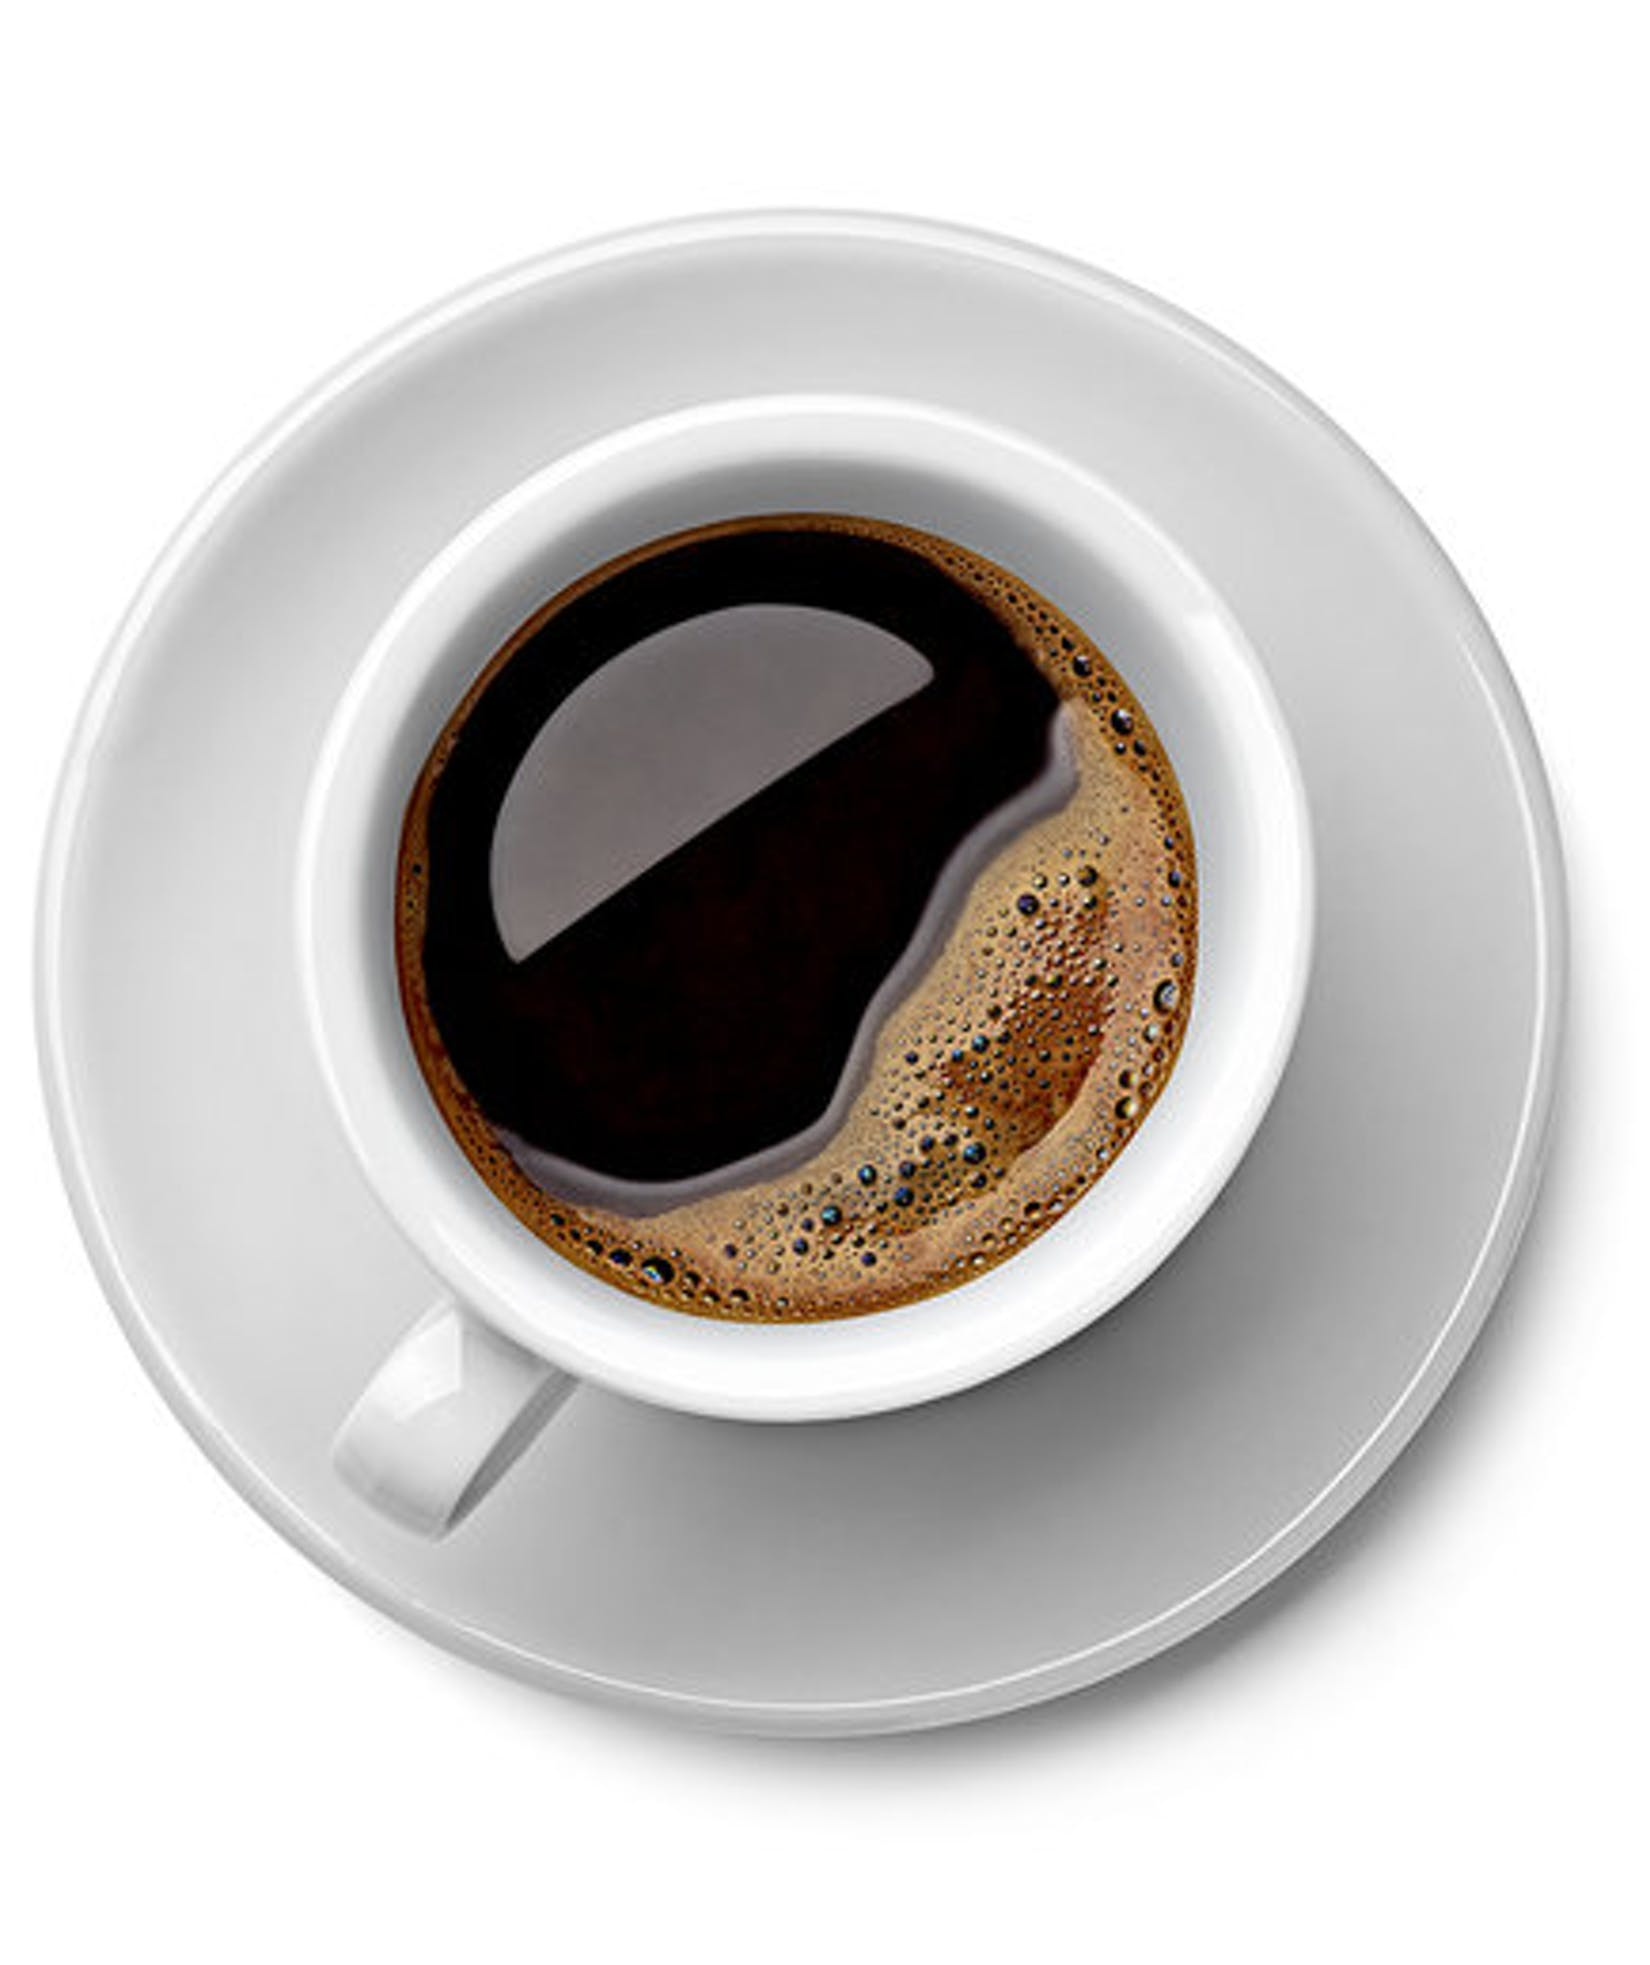 Pwint Oo Cafe | yathar